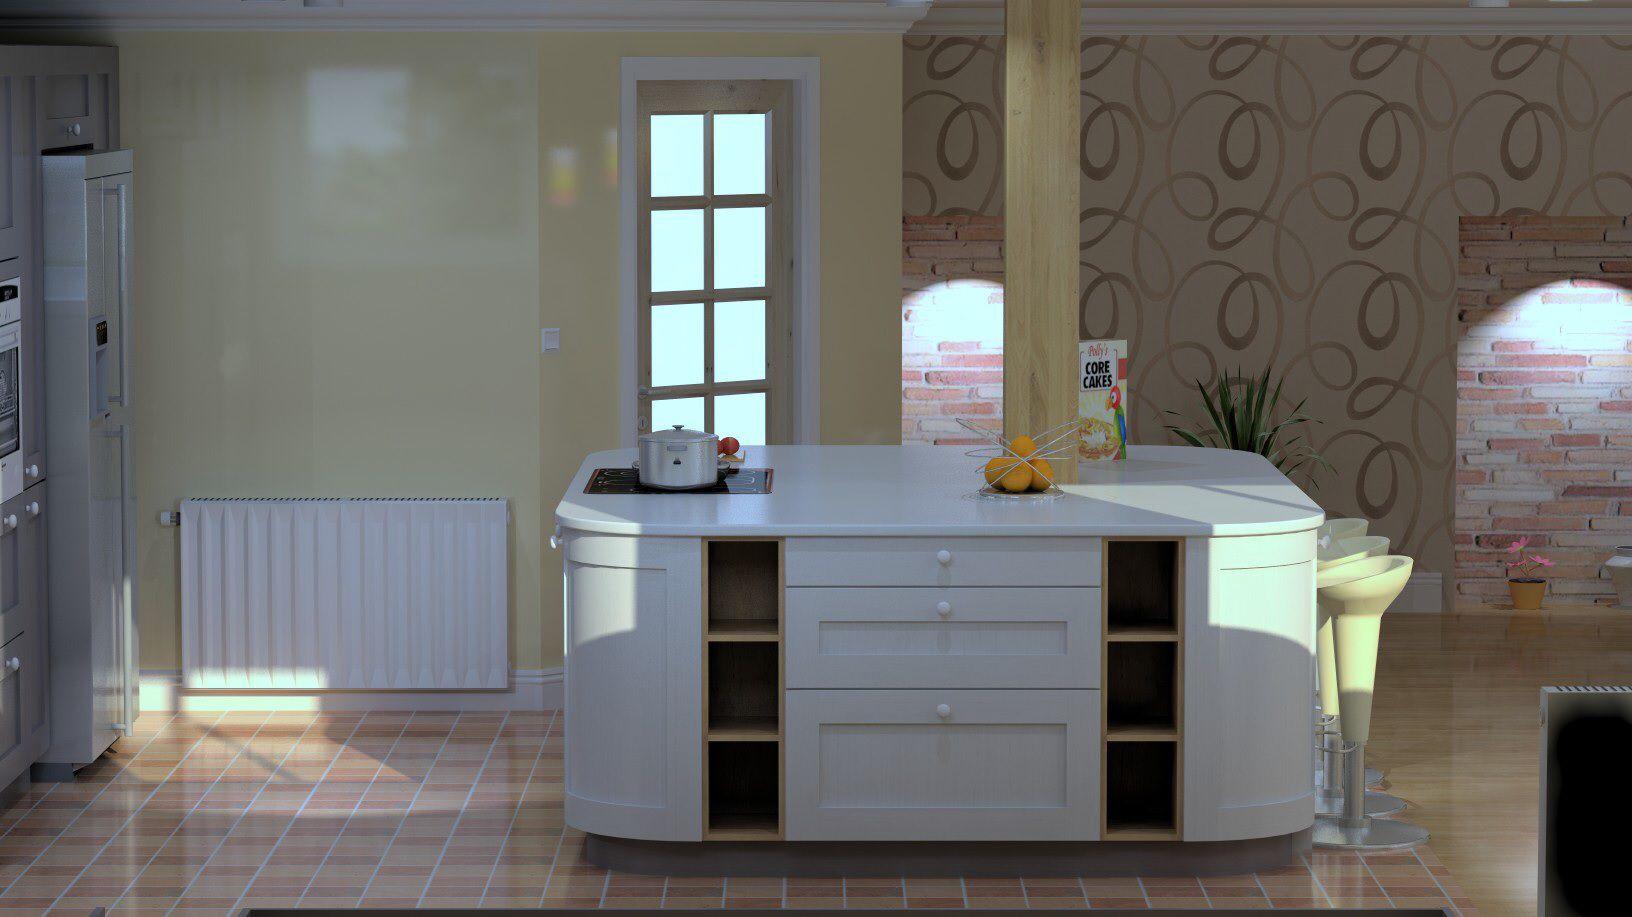 Schuller C Painted Shaker Kitchen Drawn On Compusoft Cad Software Amusing Kitchen Design Cad Software Design Decoration